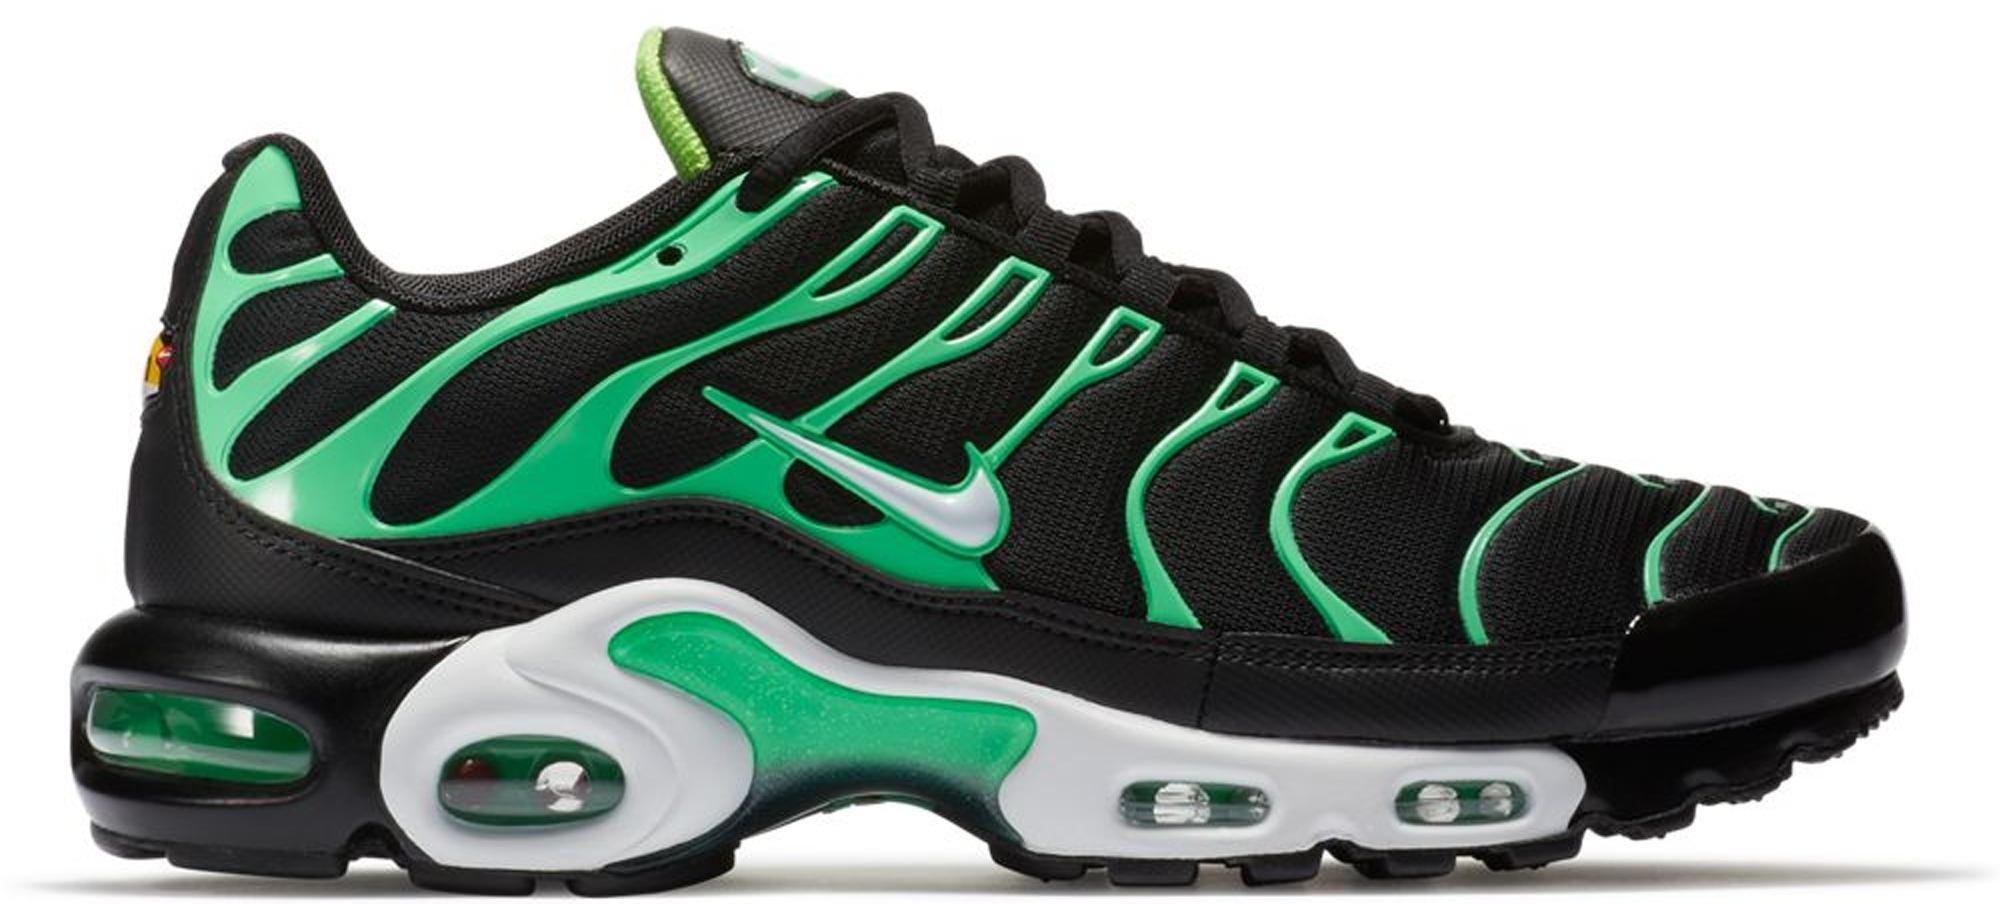 hot sale online 16c8e 1f34d Men's Air Max Plus Black Electric Green